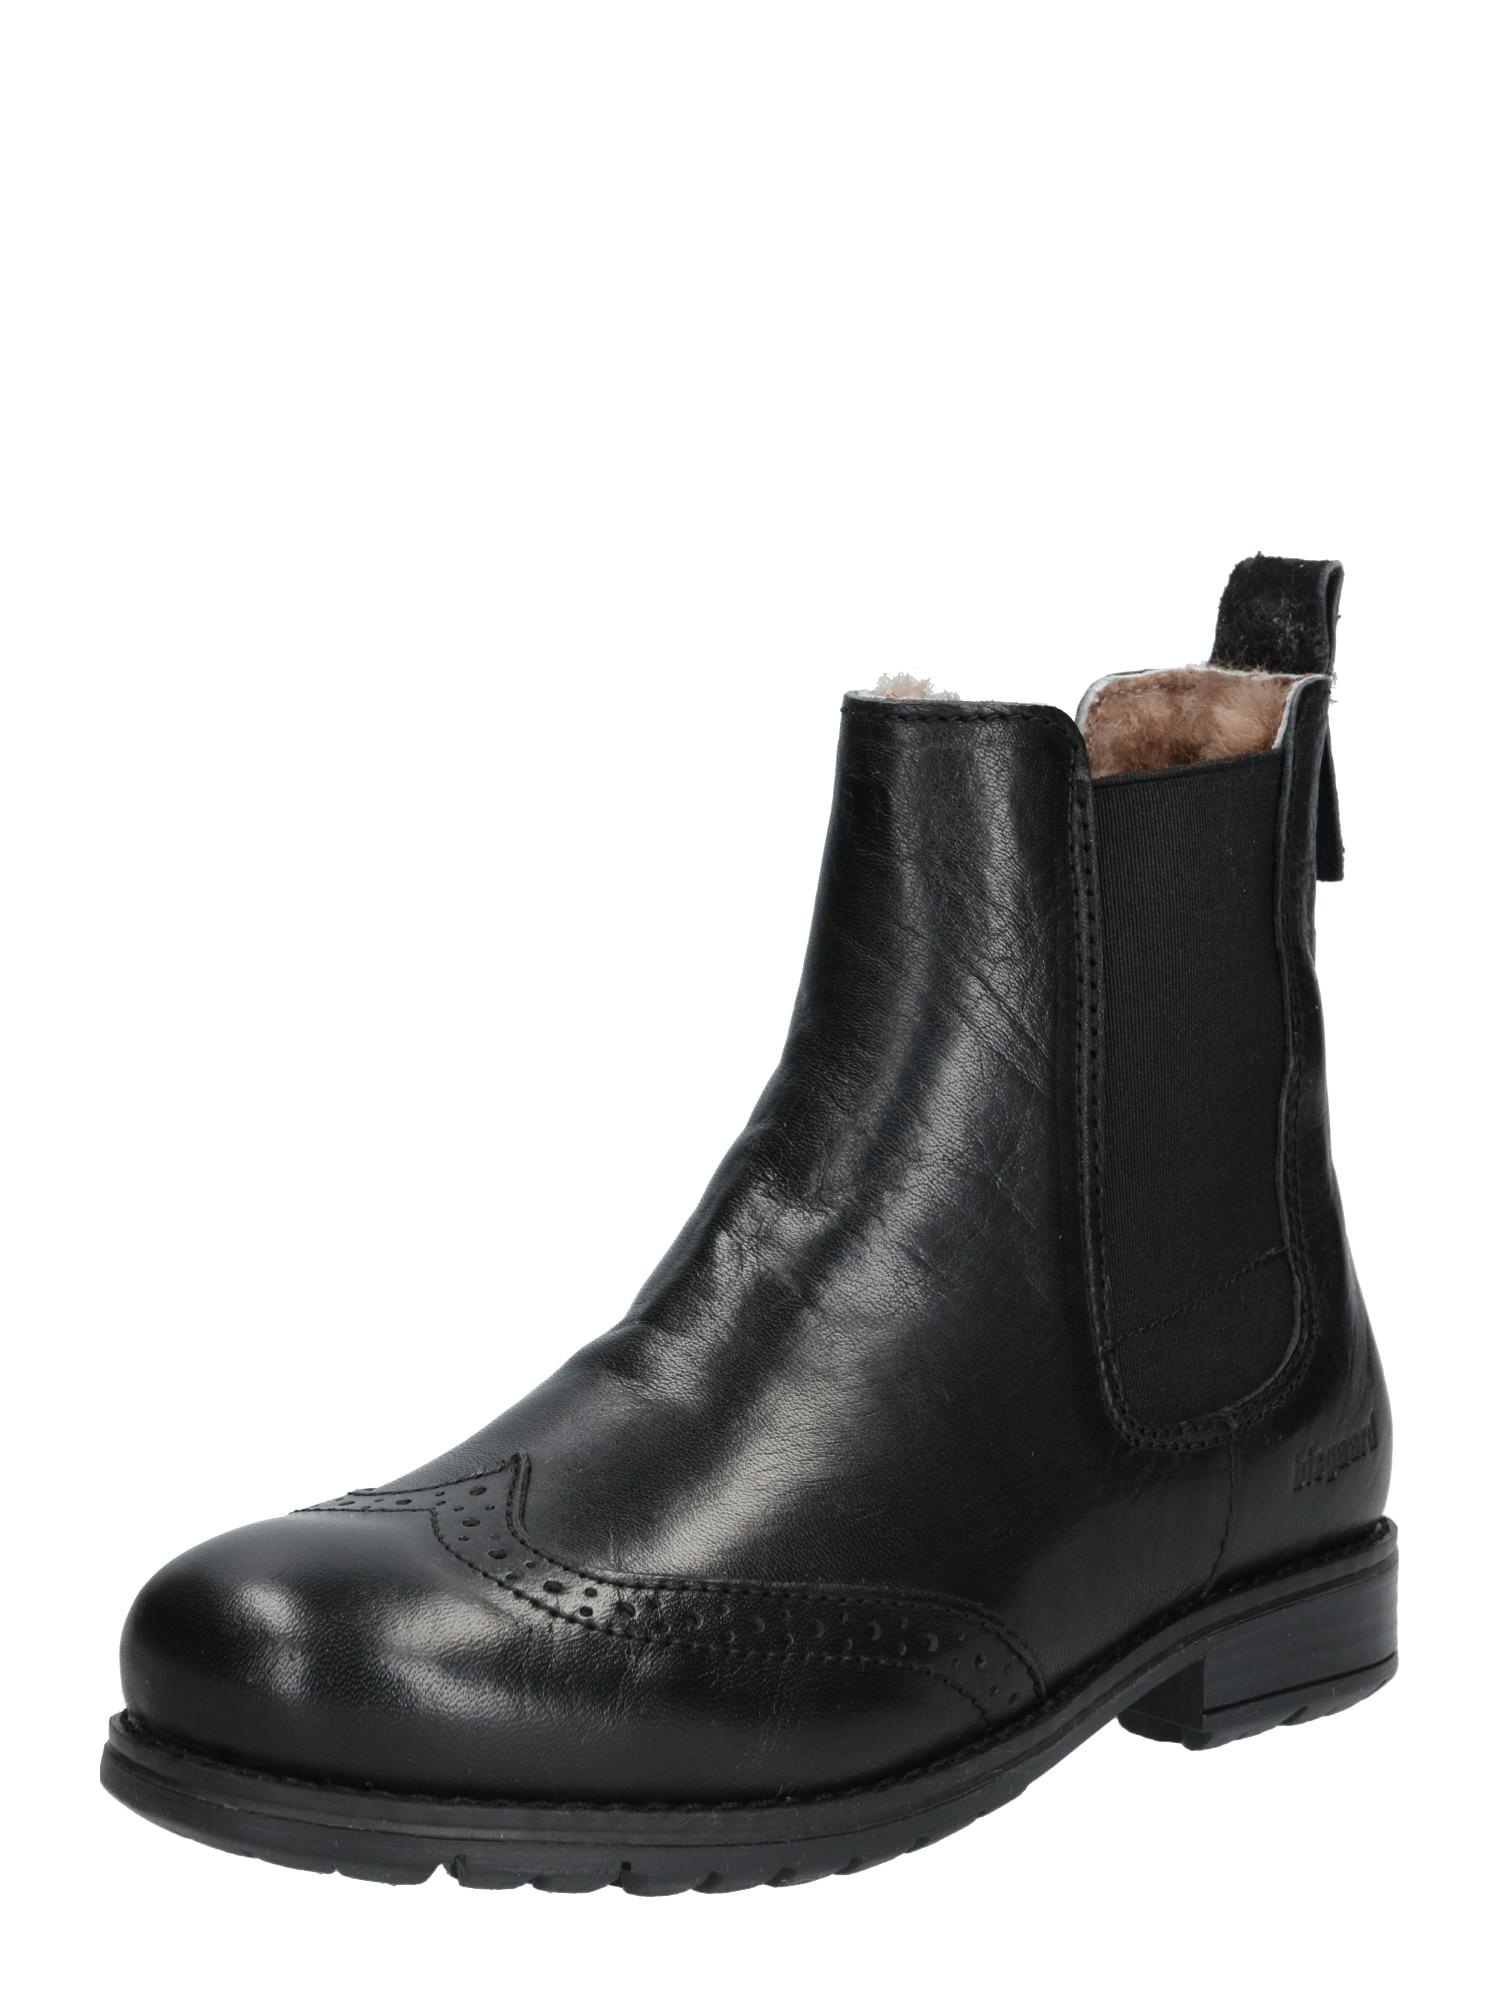 BISGAARD Auliniai batai su kulniuku juoda